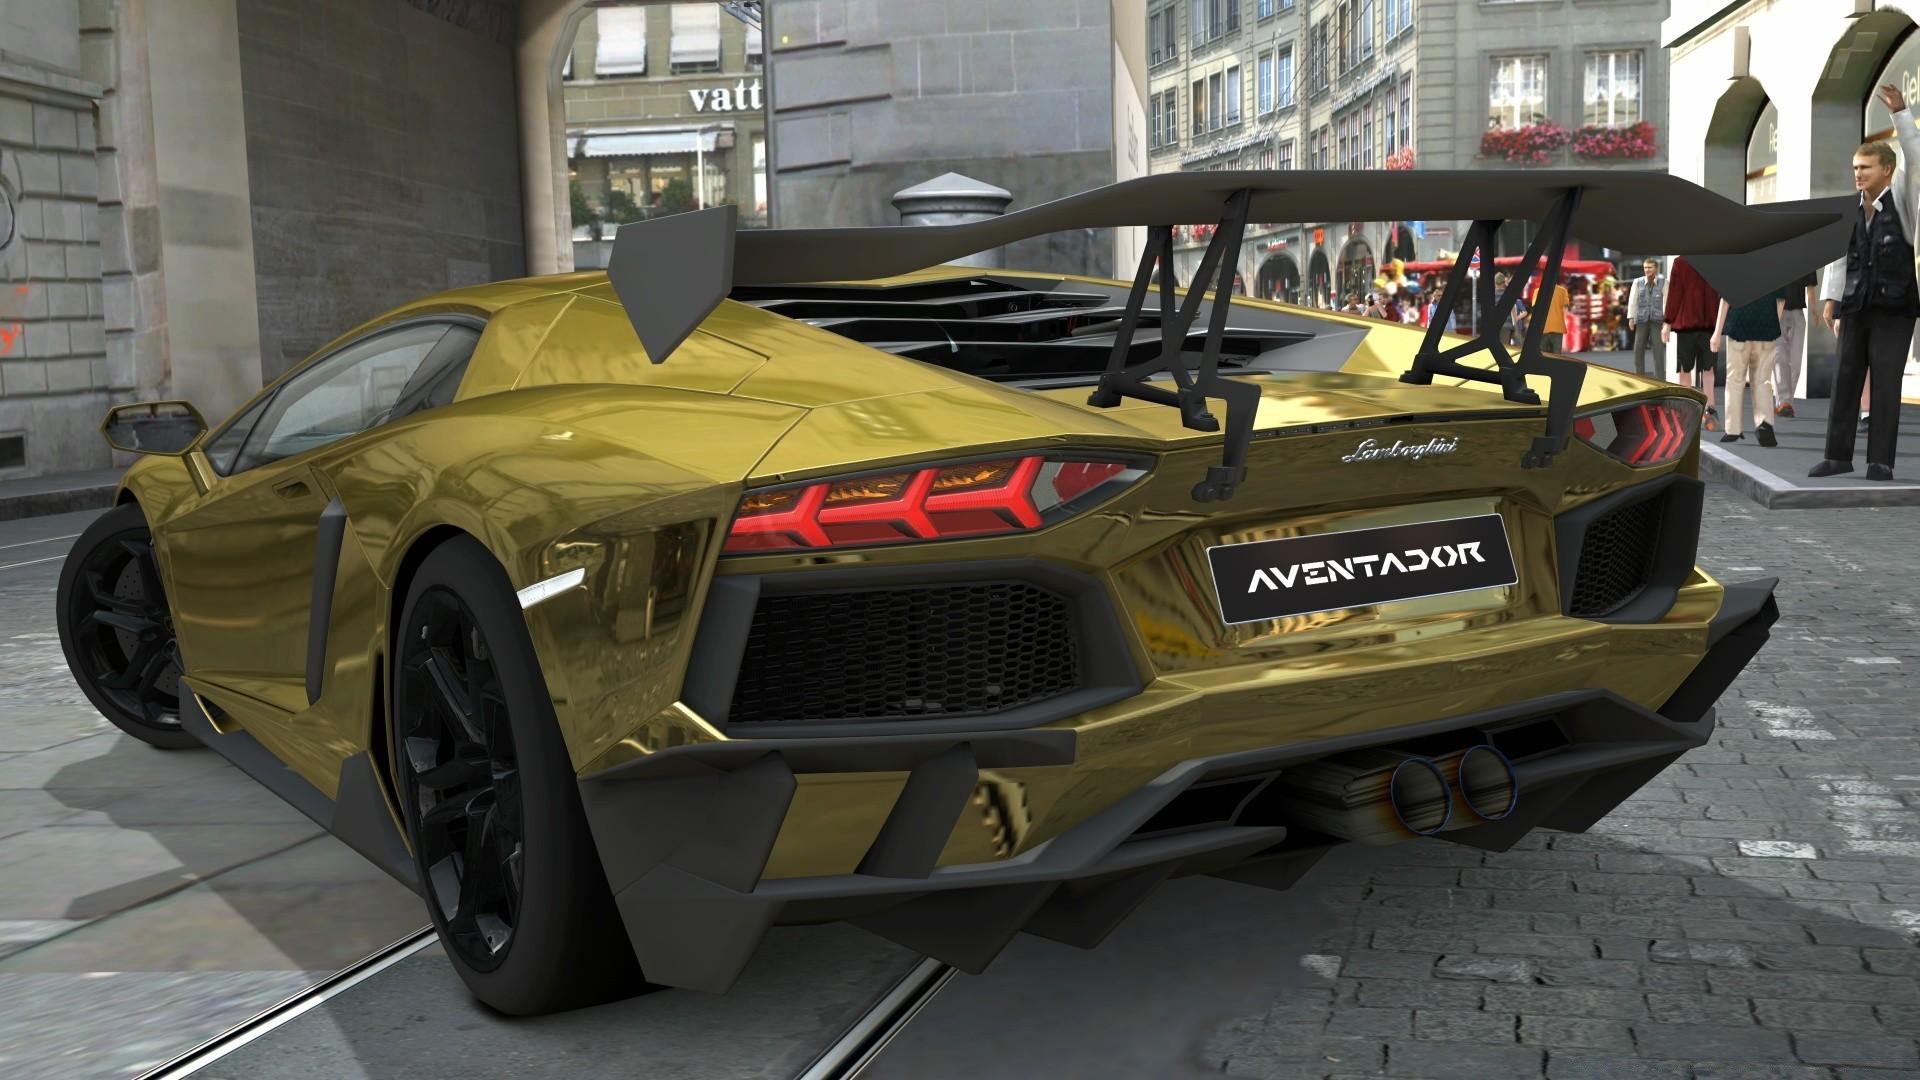 Lamborghini Aventador LP700 4 Gold Chrome Gran Turismo 5 Desktop Wallpapers For Free